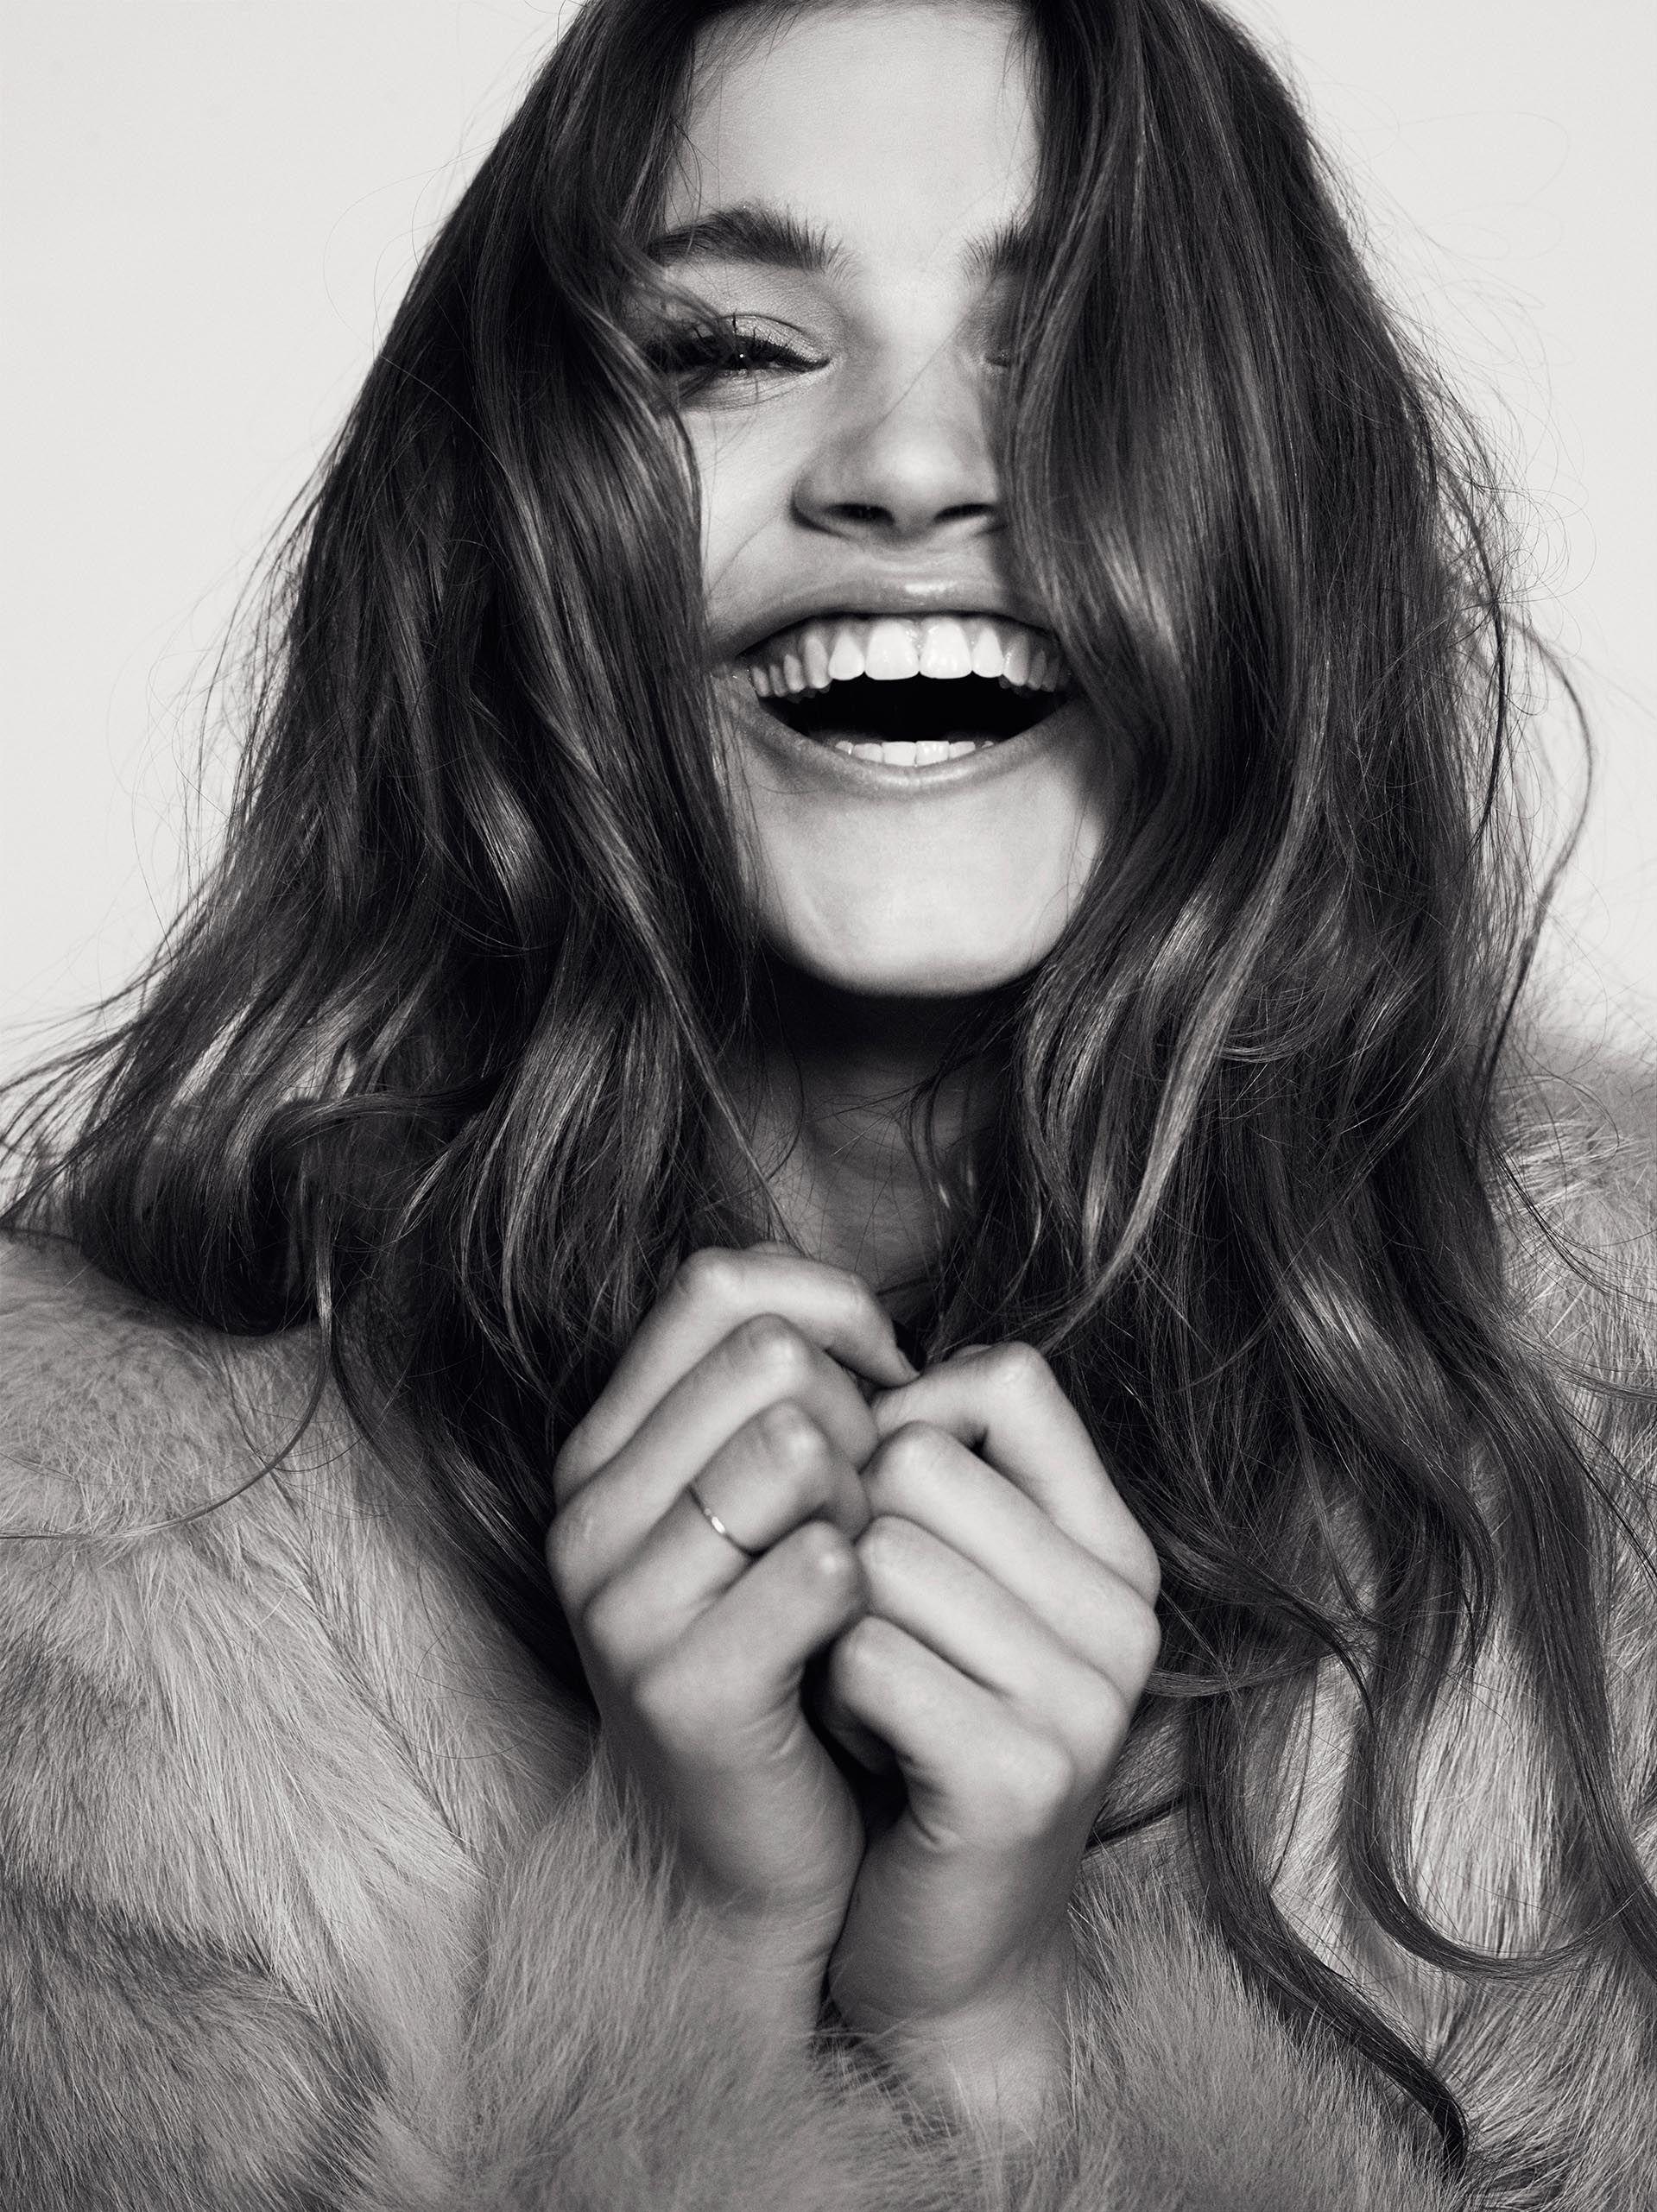 Cleavage Elise Harritz Hansen naked (99 photos), Sexy, Hot, Boobs, braless 2020